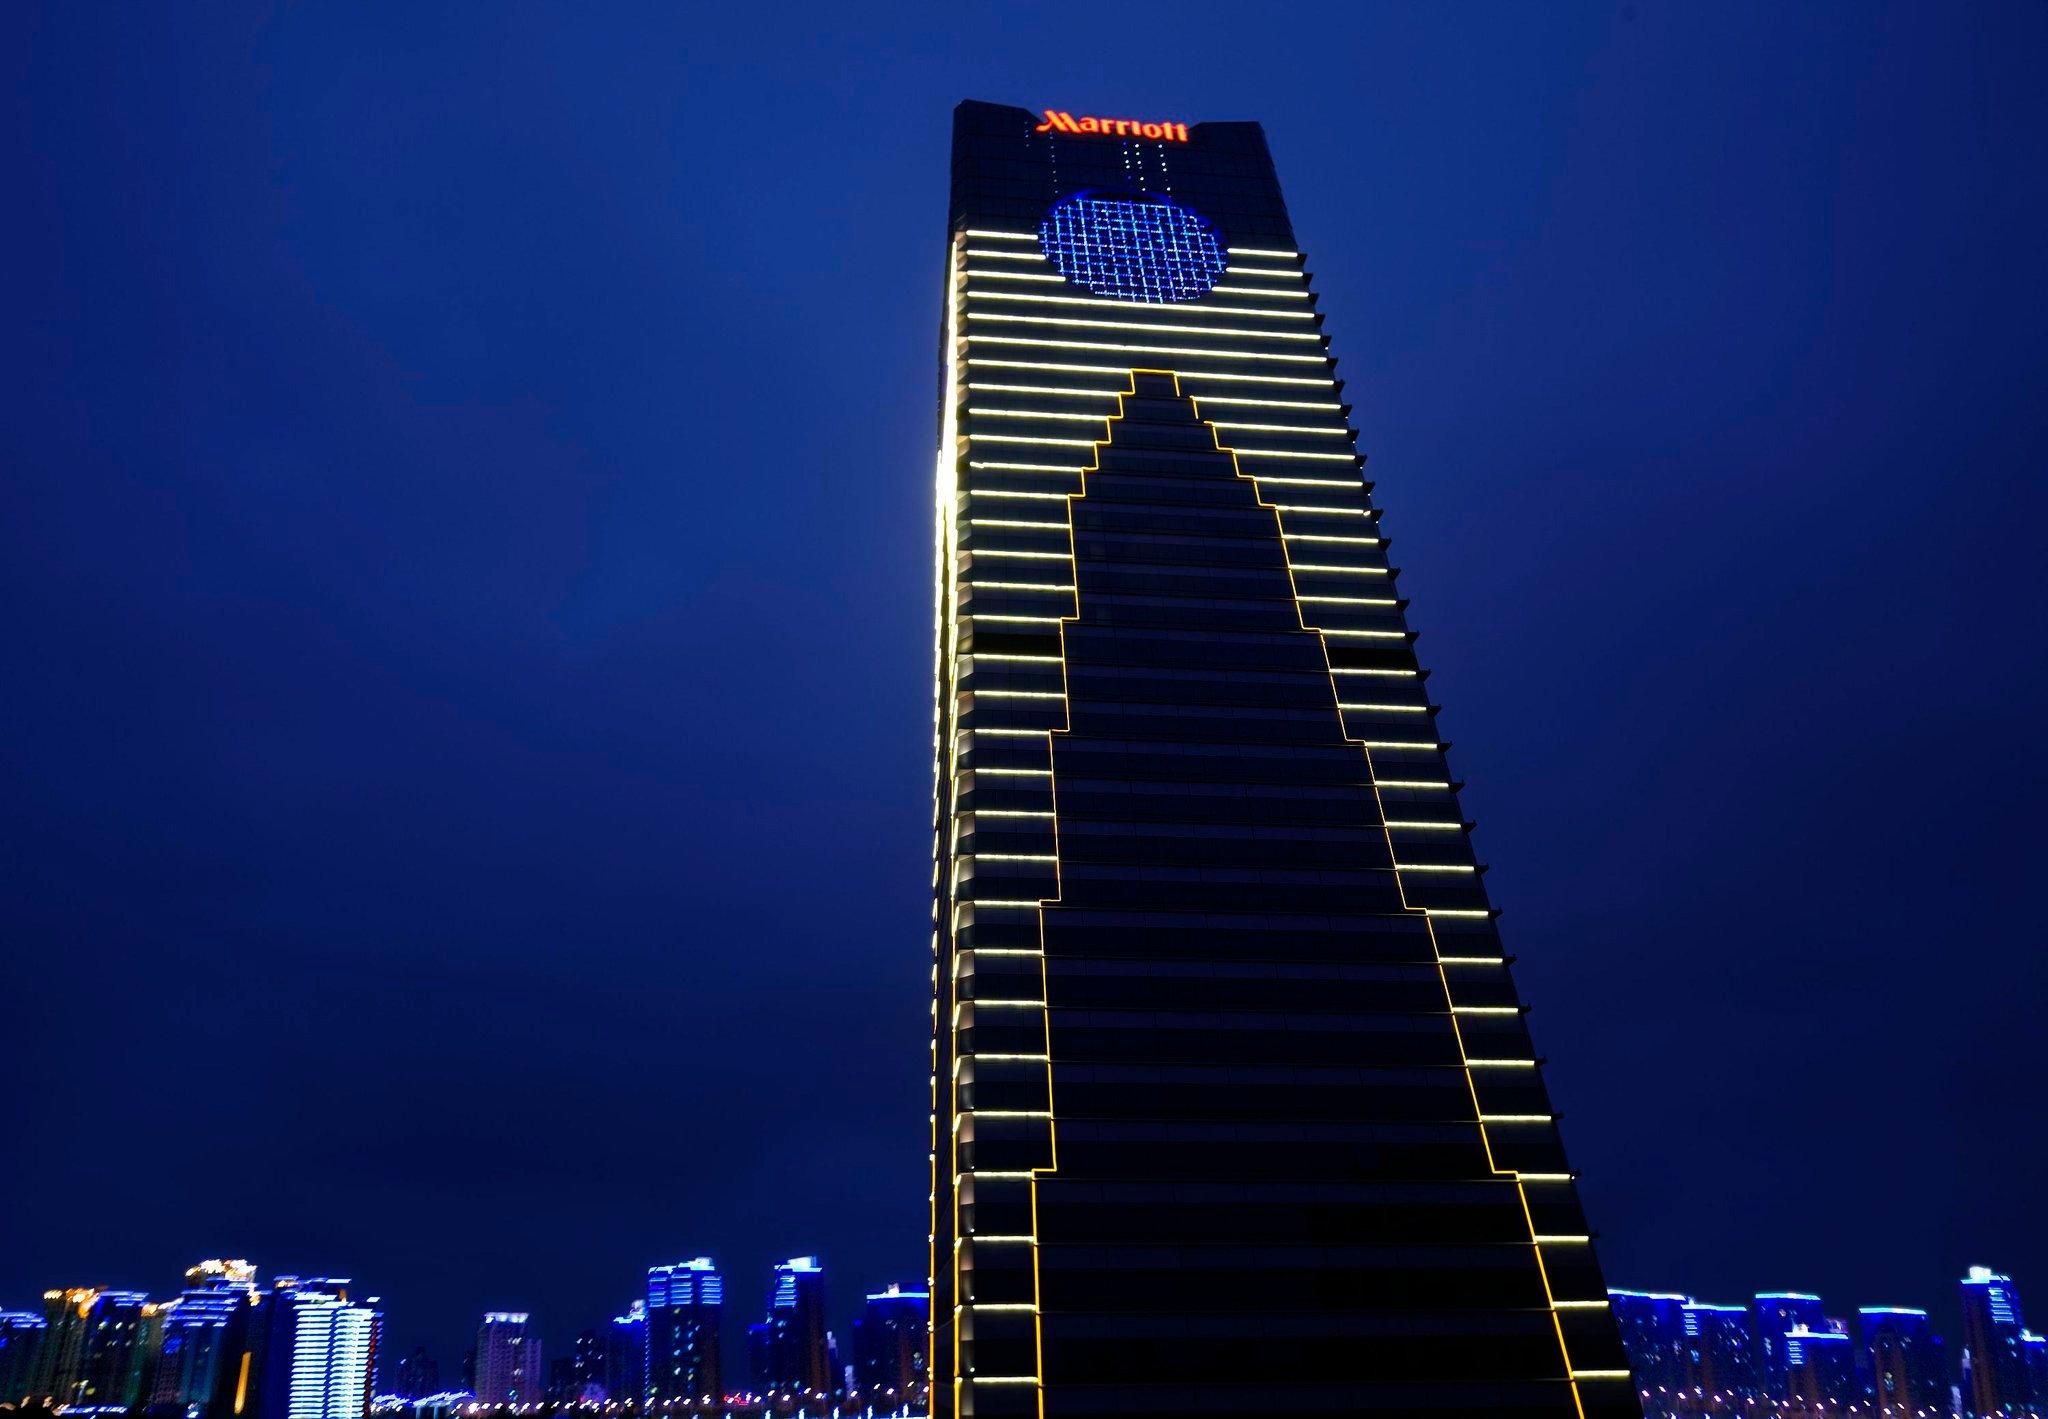 Suzhou Marriott Hotel